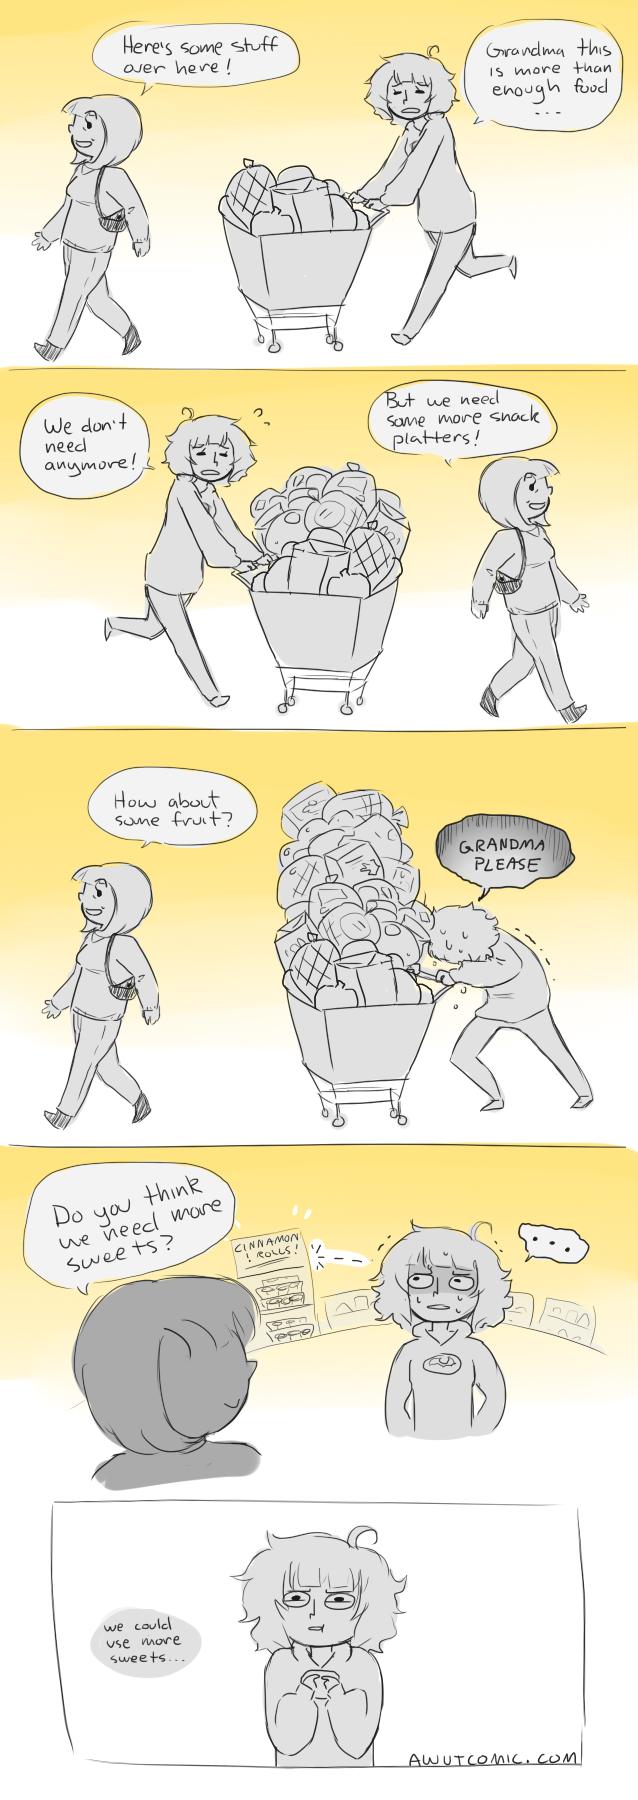 Shoppin! by vSock